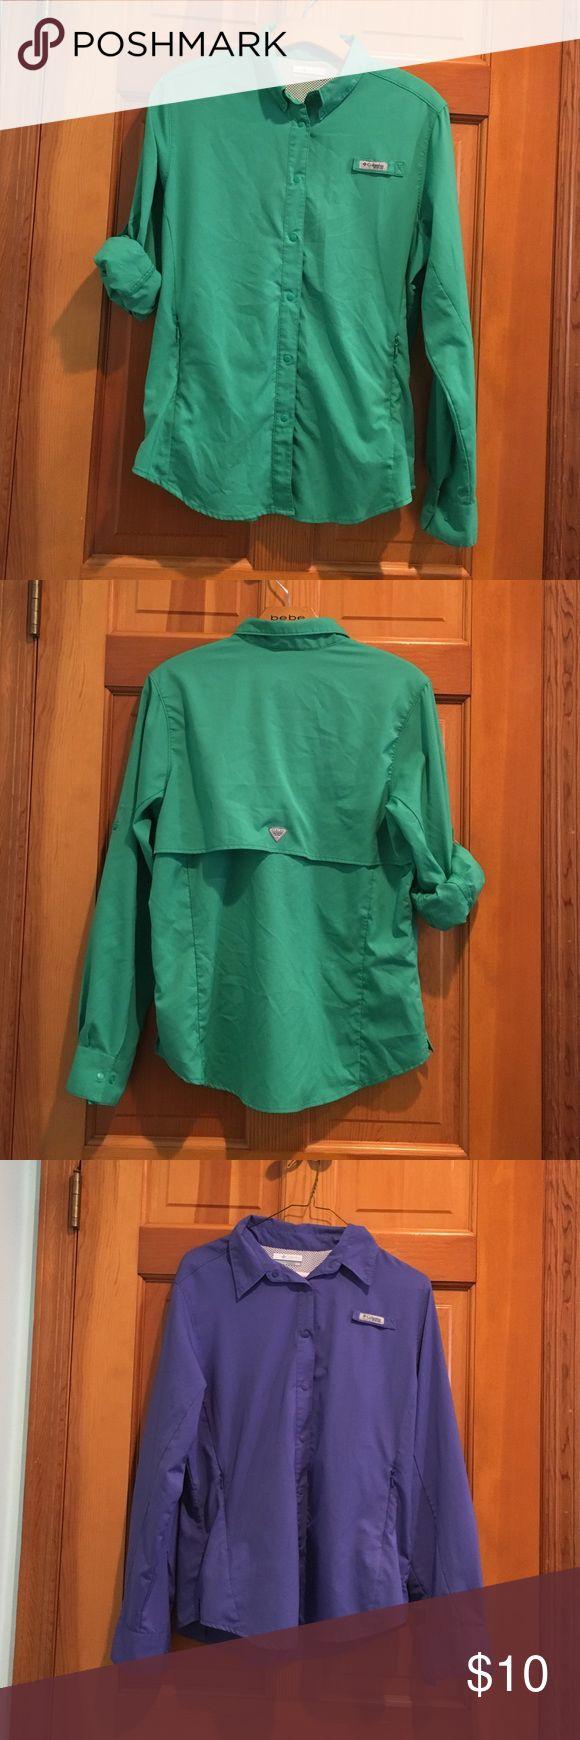 Columbia Sportswear PFG shirt Columbia Sportswear PFG Fishing Shirt - Long Sleeve- size M. Green and Purple Columbia Tops Button Down Shirts